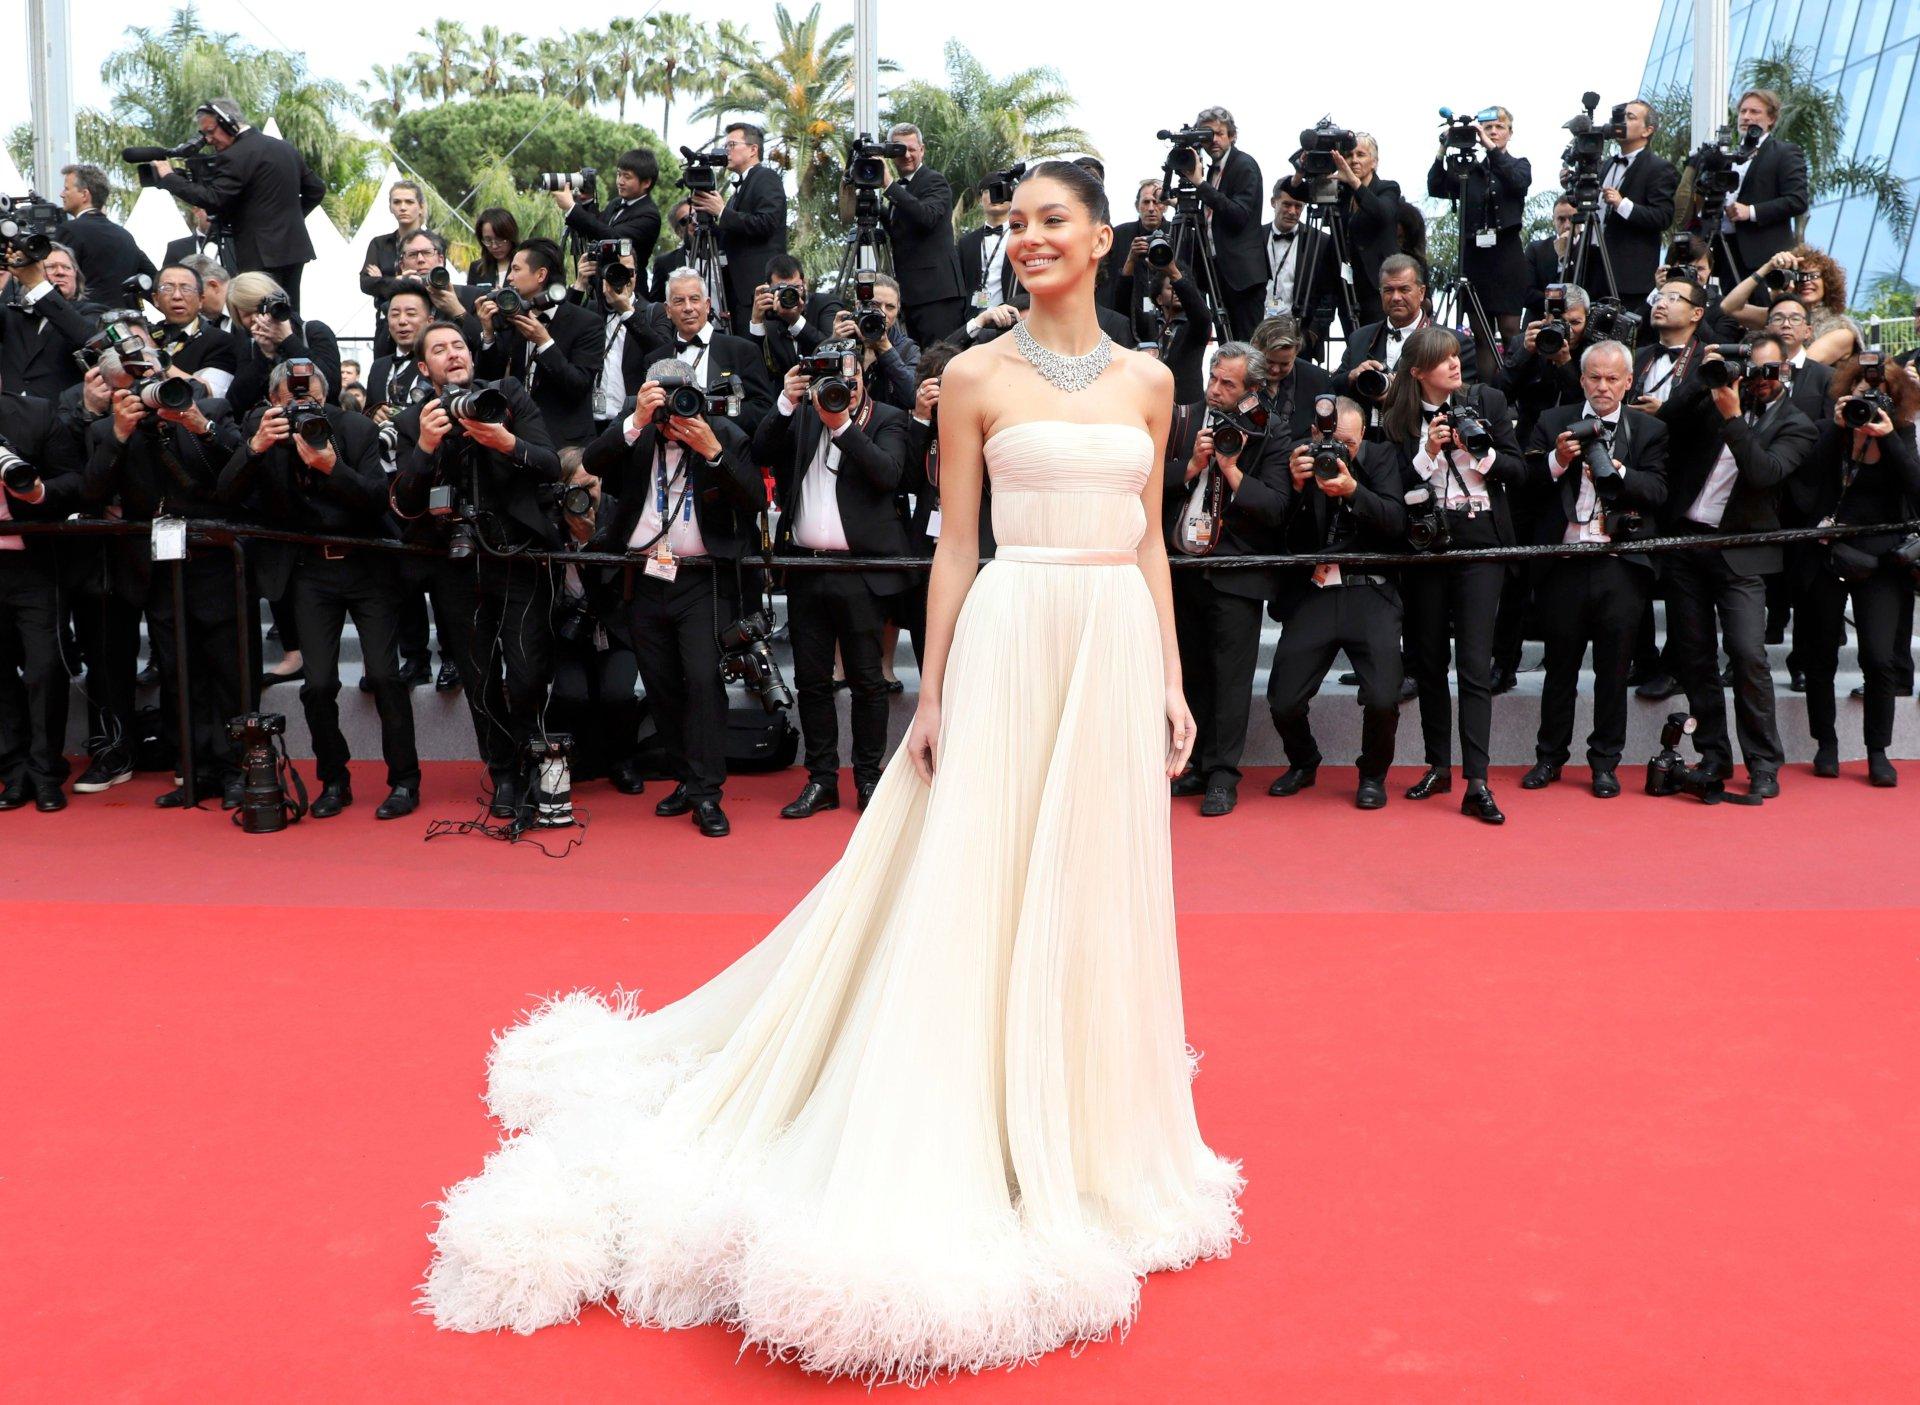 Camila Morrone Beautiful White Dress